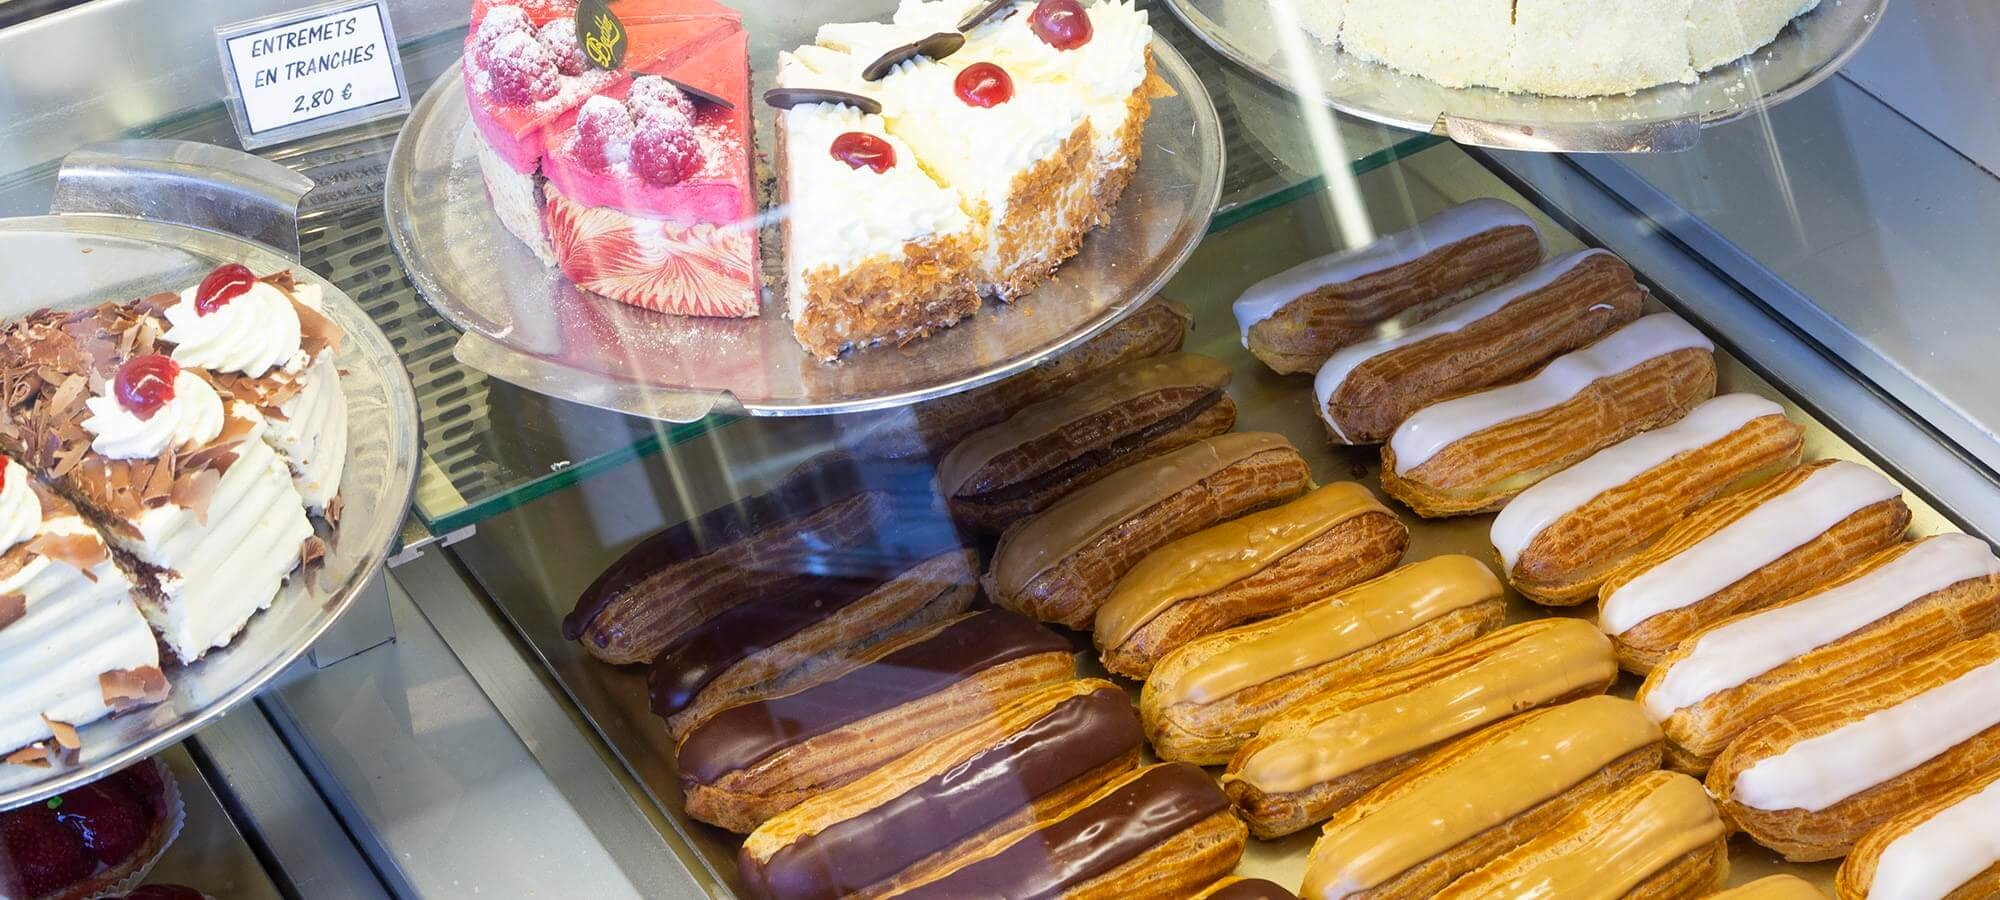 Boulangerie pâtisserie chocolaterie Bechler